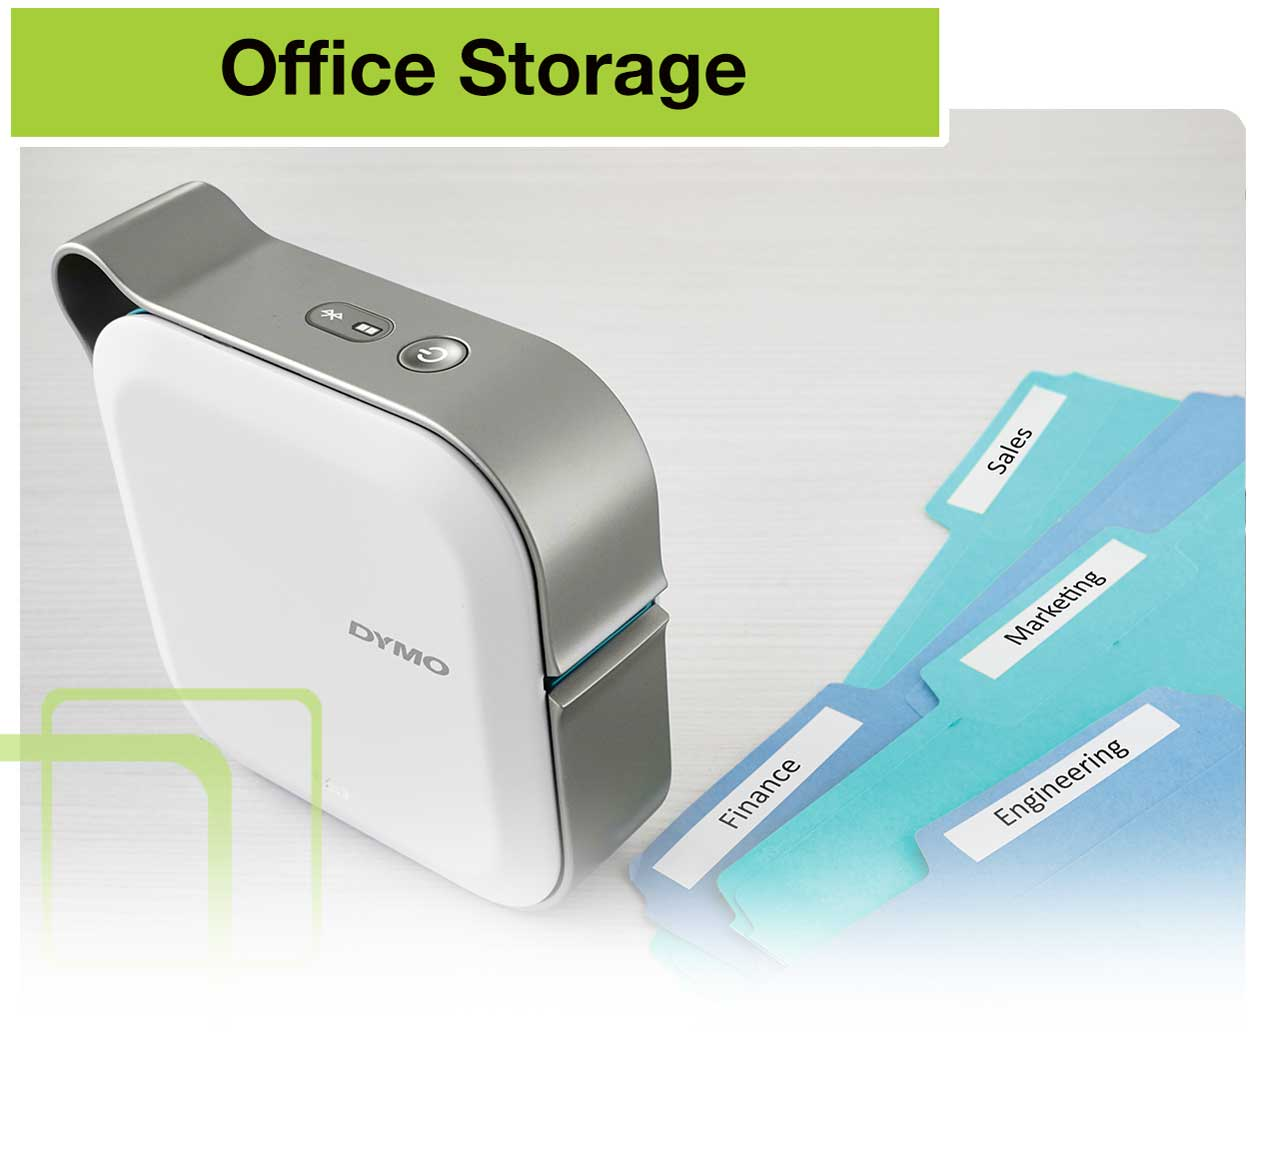 Shop All Office Storage